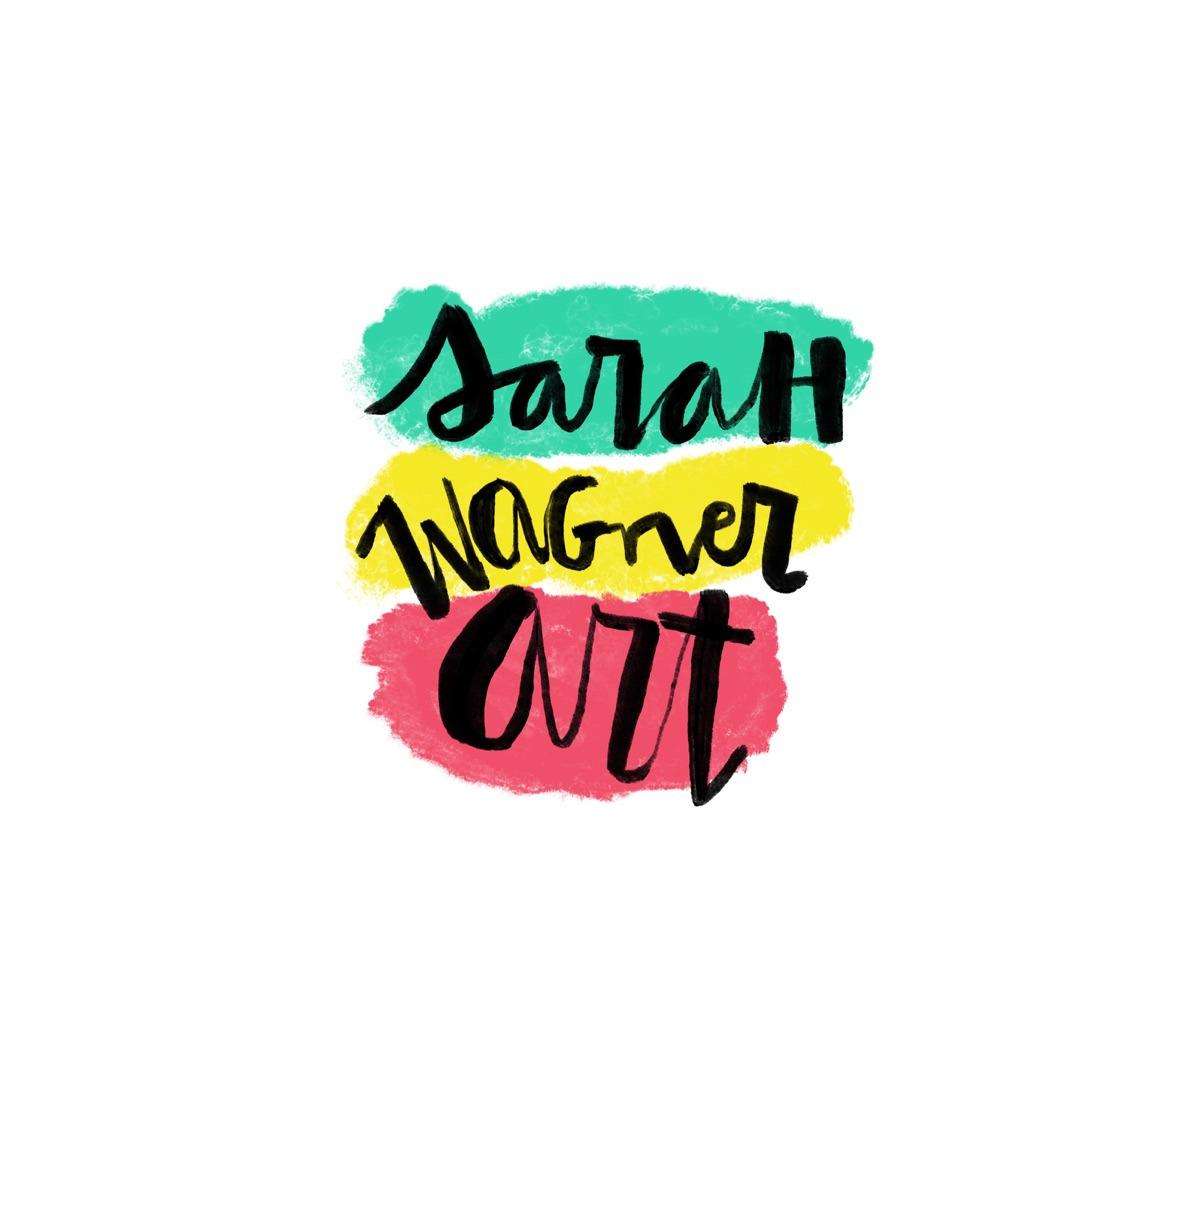 sarah wagner art (@sarahwagnerart) Cover Image